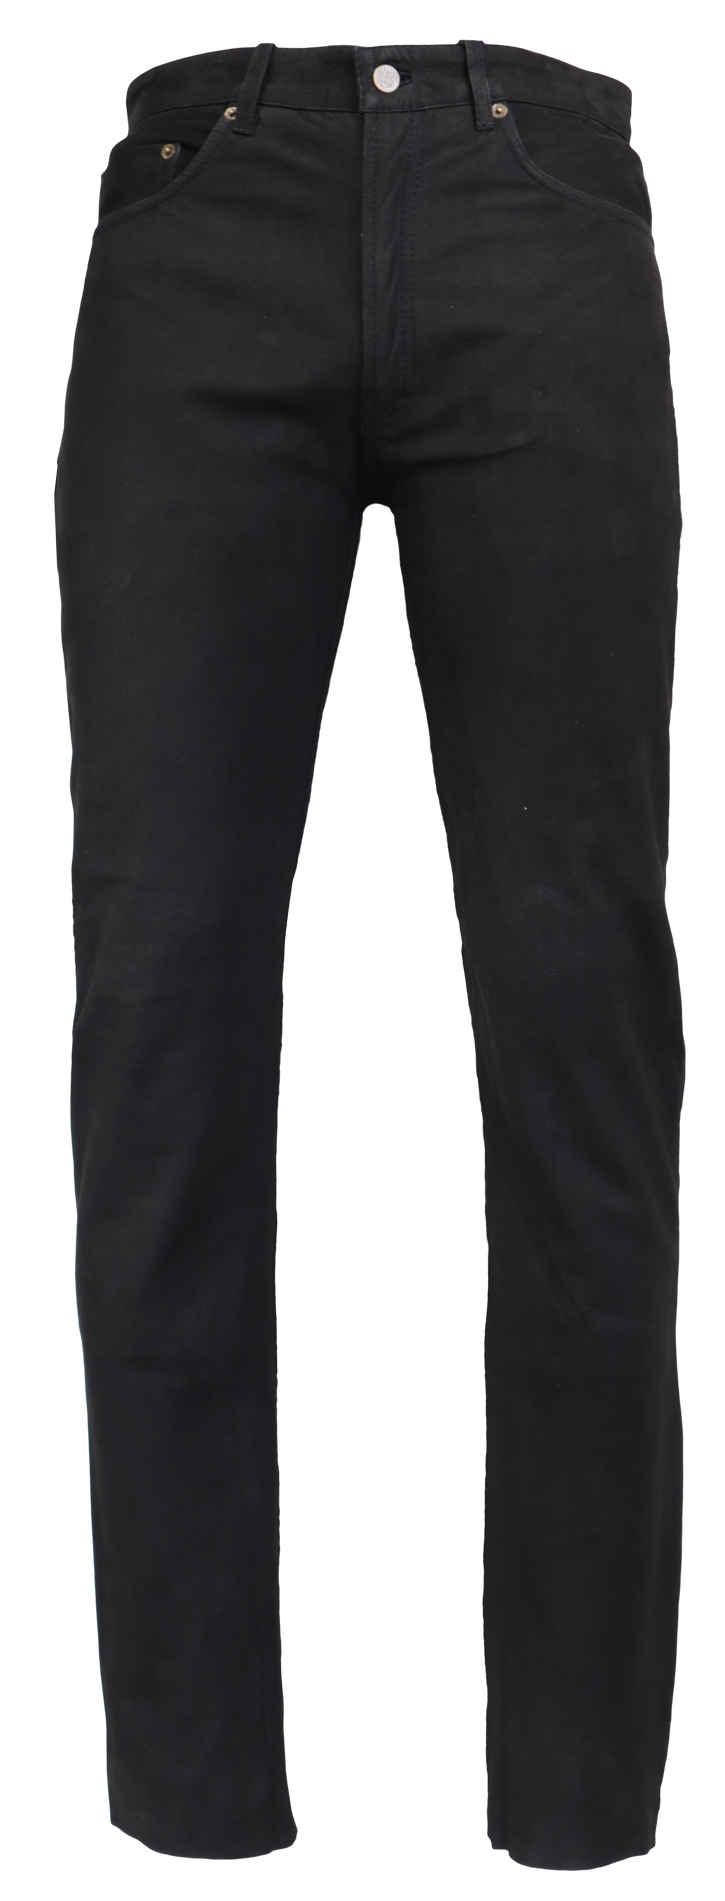 RICANO Lederhose »RT-101« Hochwertiges Büffel-Nubuk Leder ; 5-Pocket-Stil - Lederjeans